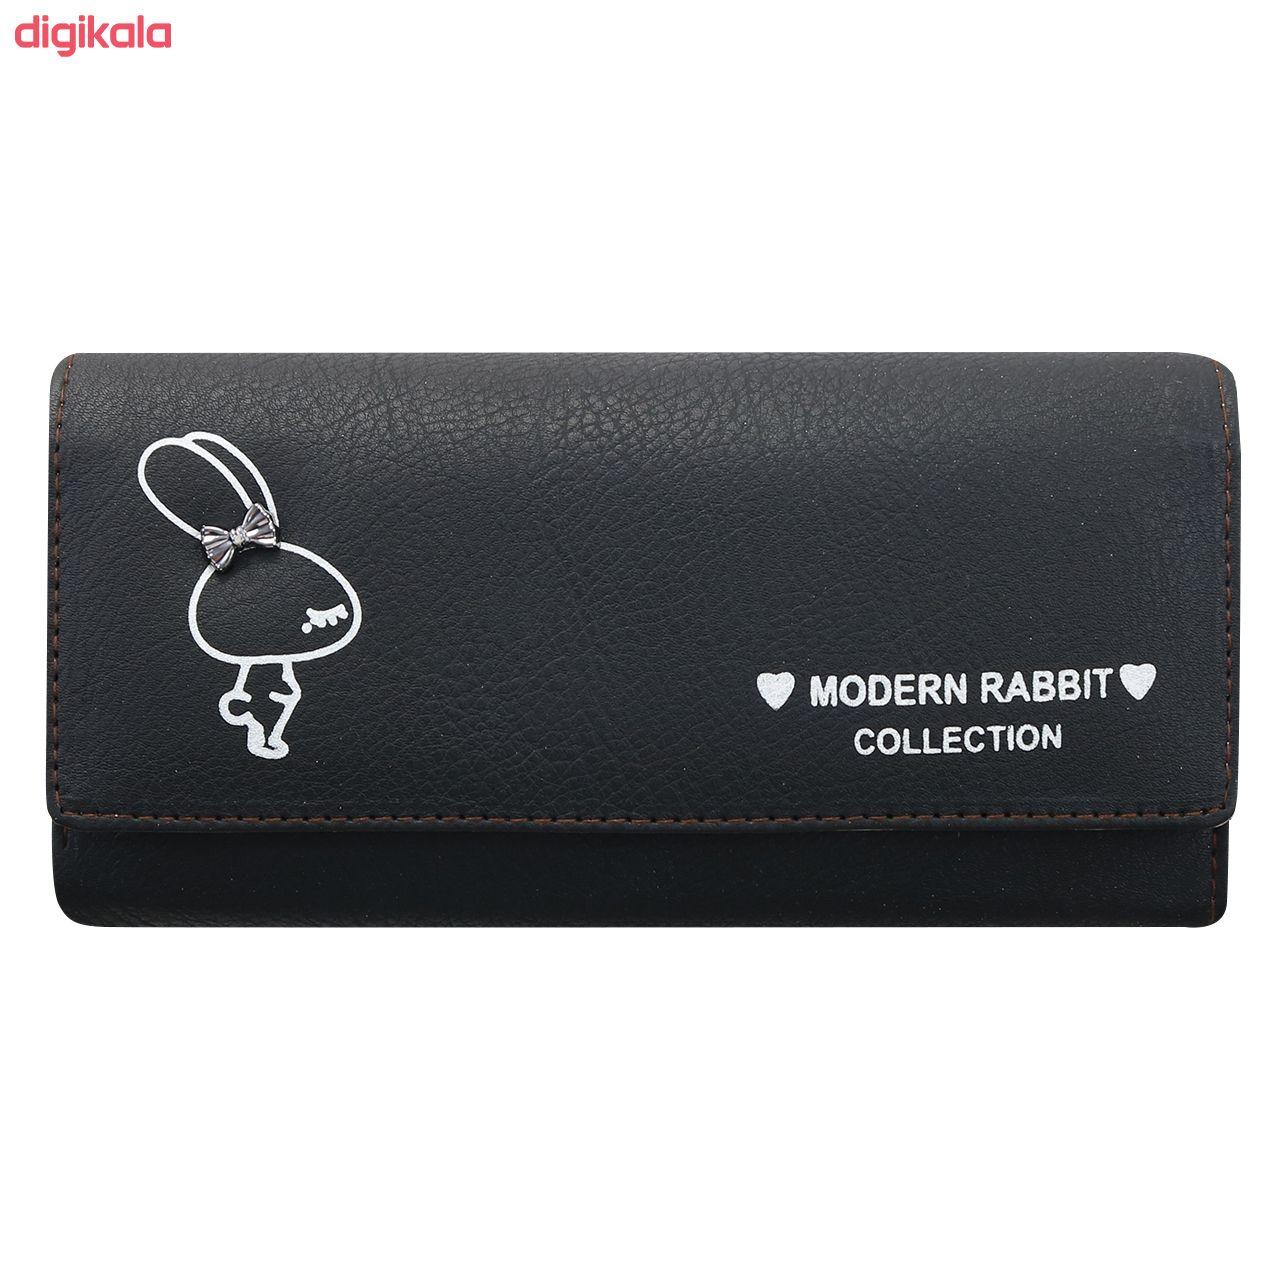 کیف پول زنانه طرح خرگوش کد BG 33 main 1 8